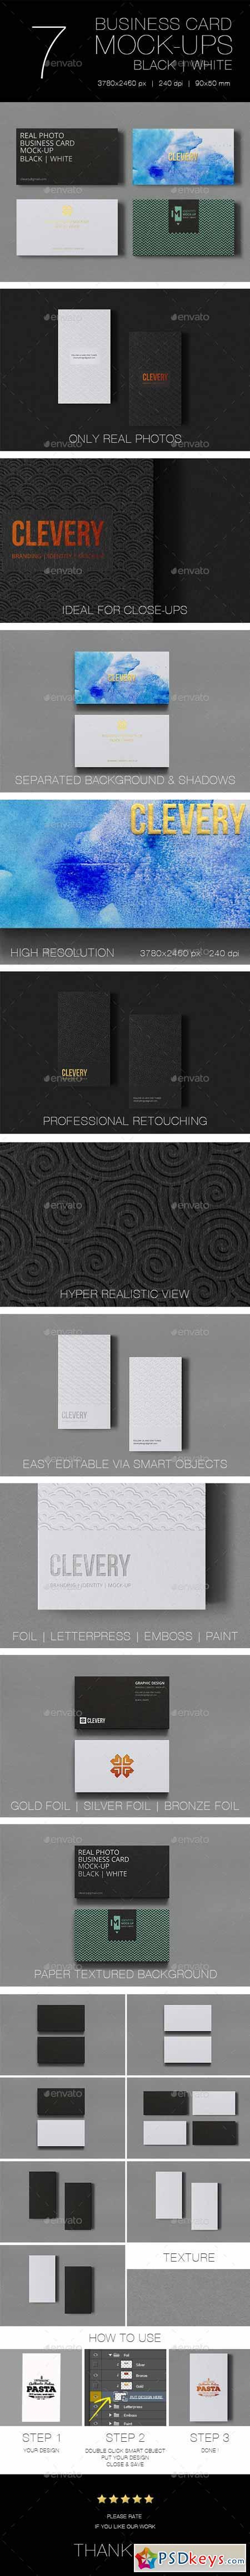 Photorealistic Business Card Mockup Black & White 10962076